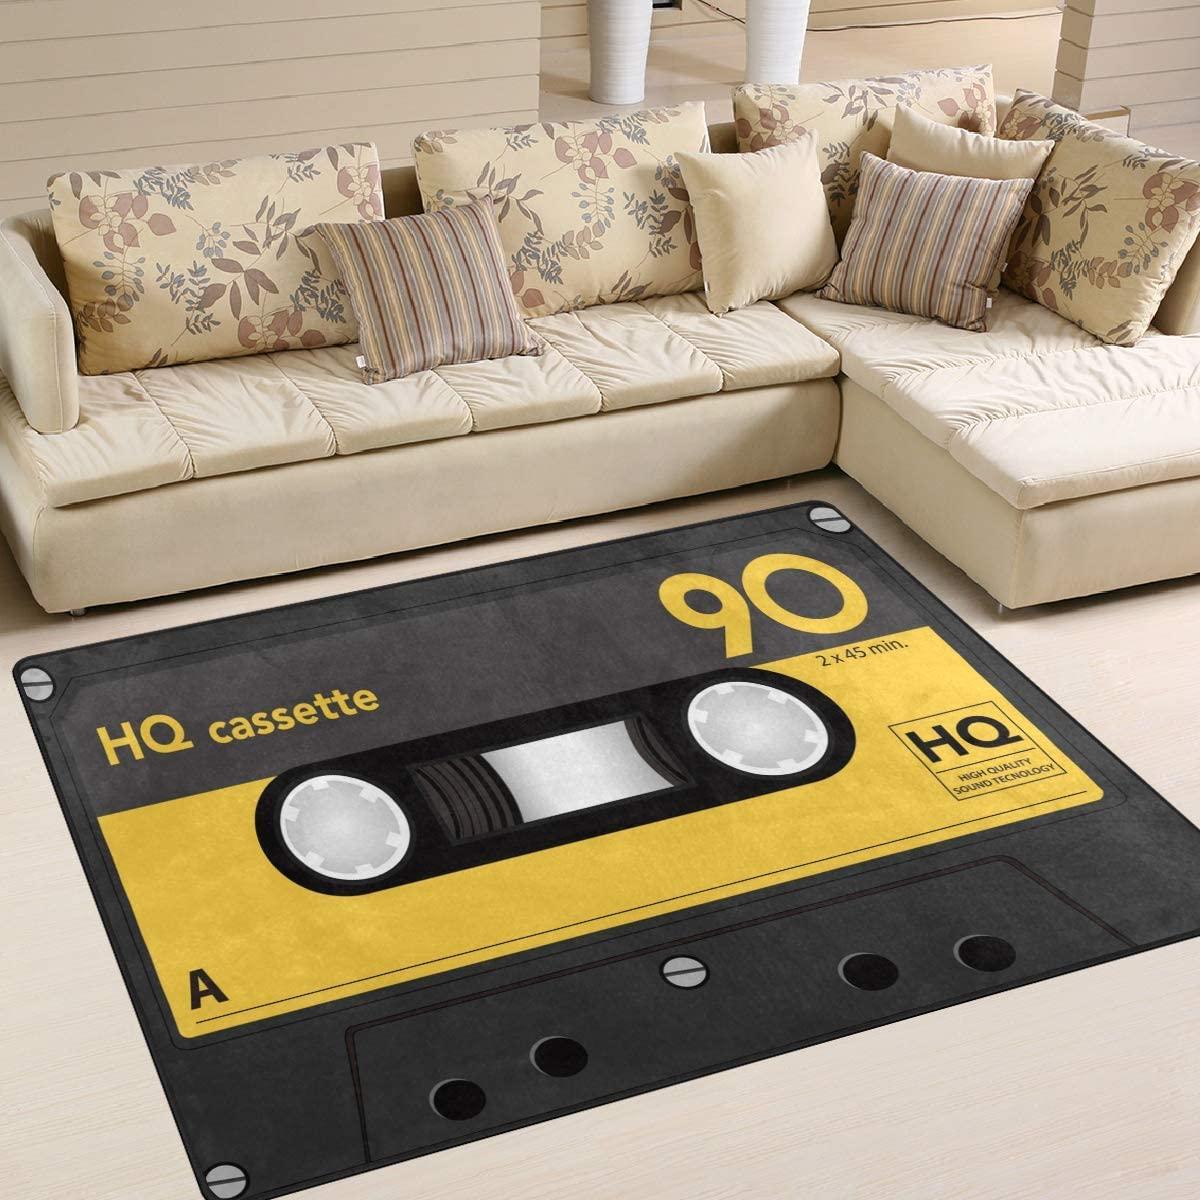 ALAZA Audio Cassette Tape Music Vintage Area Rug Rugs for Living Room Bedroom 5'3